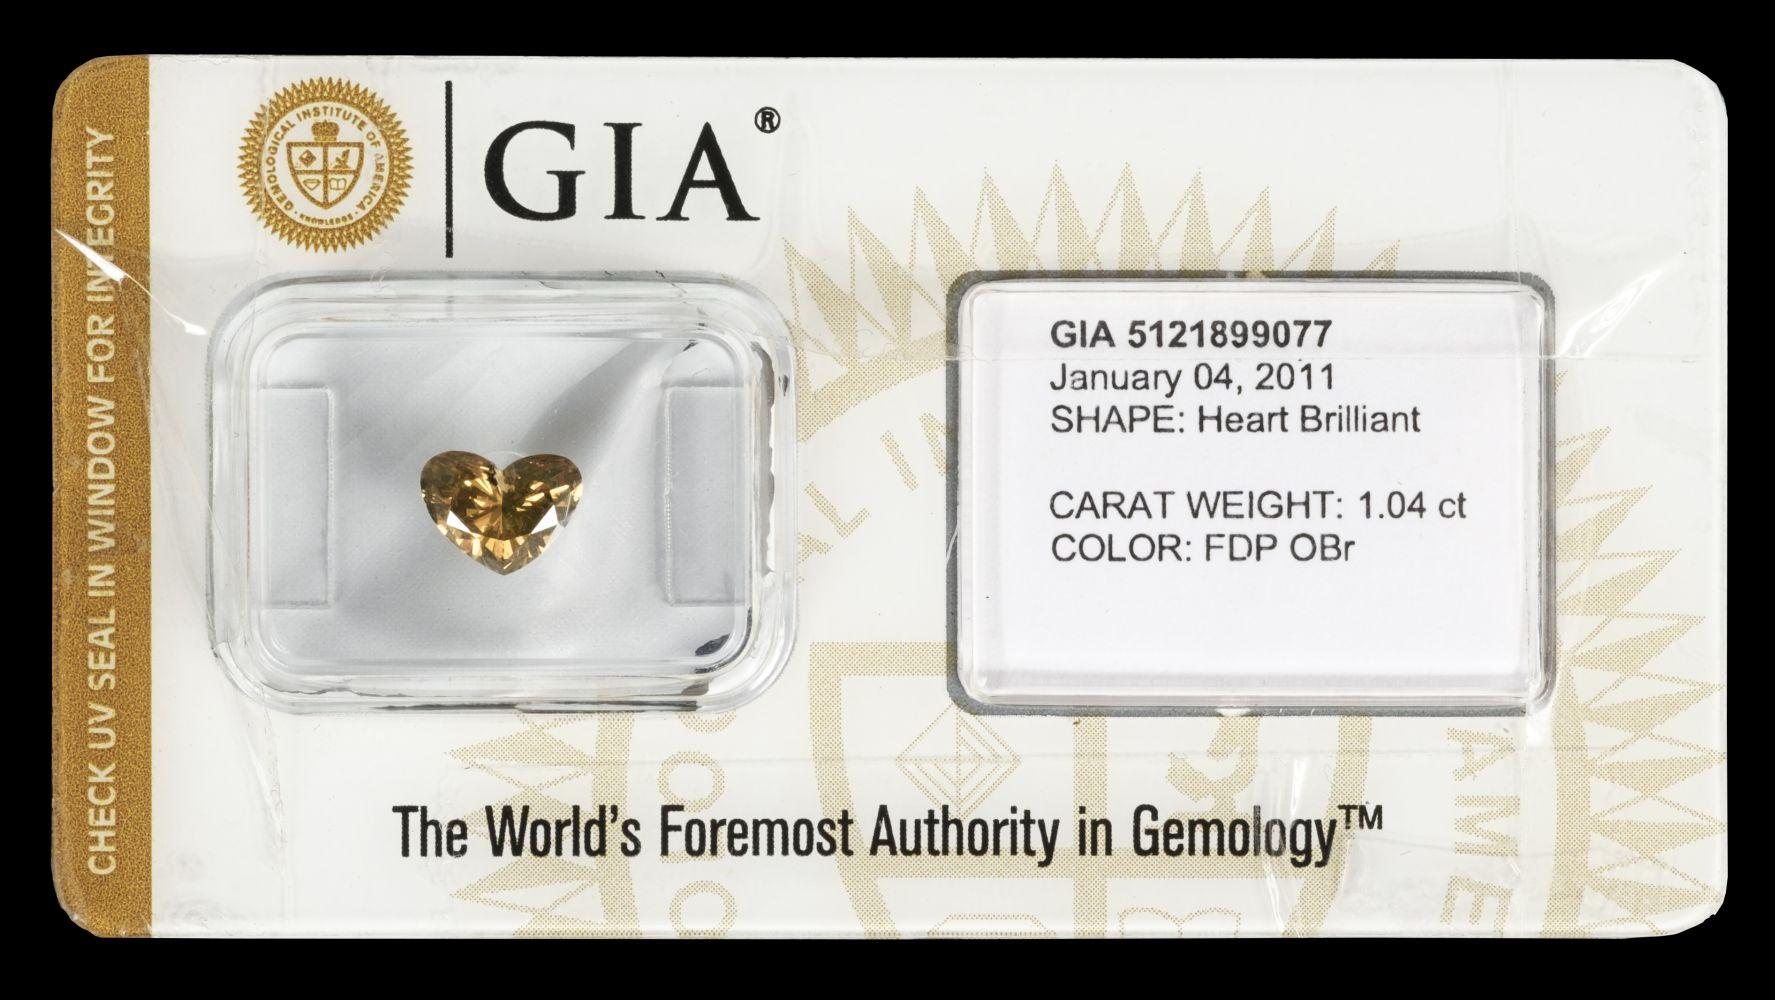 * Diamond. Heart brilliant cut diamond - GIA certified